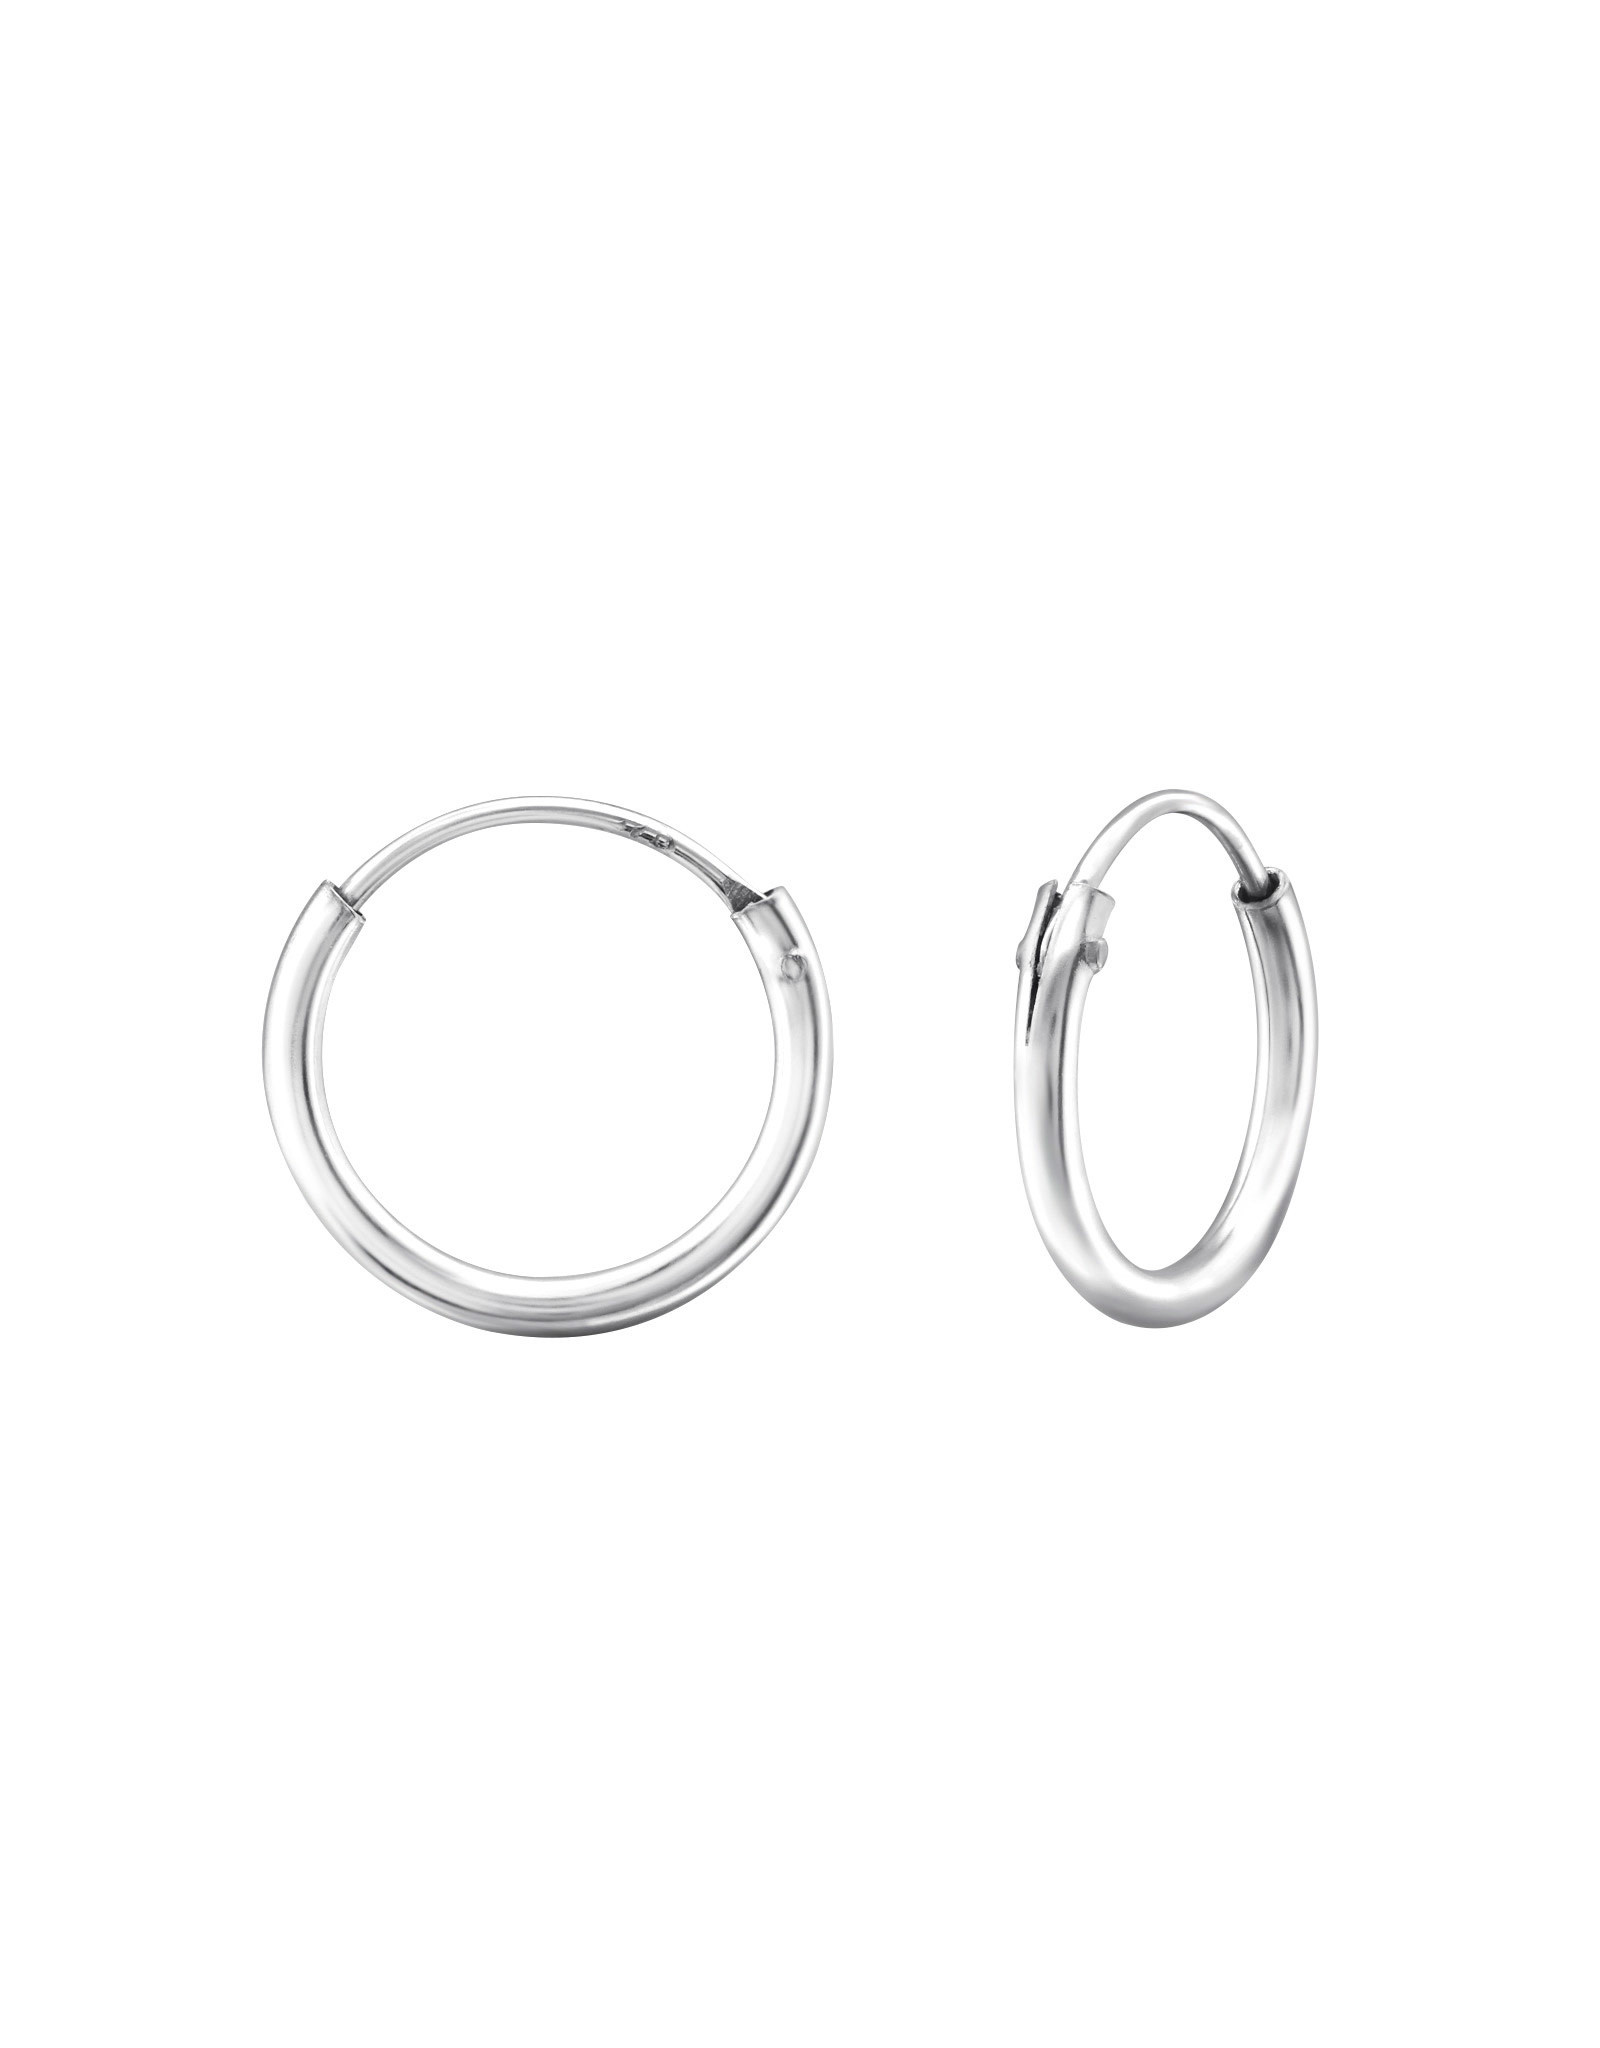 Ringetjes zilver 12mm